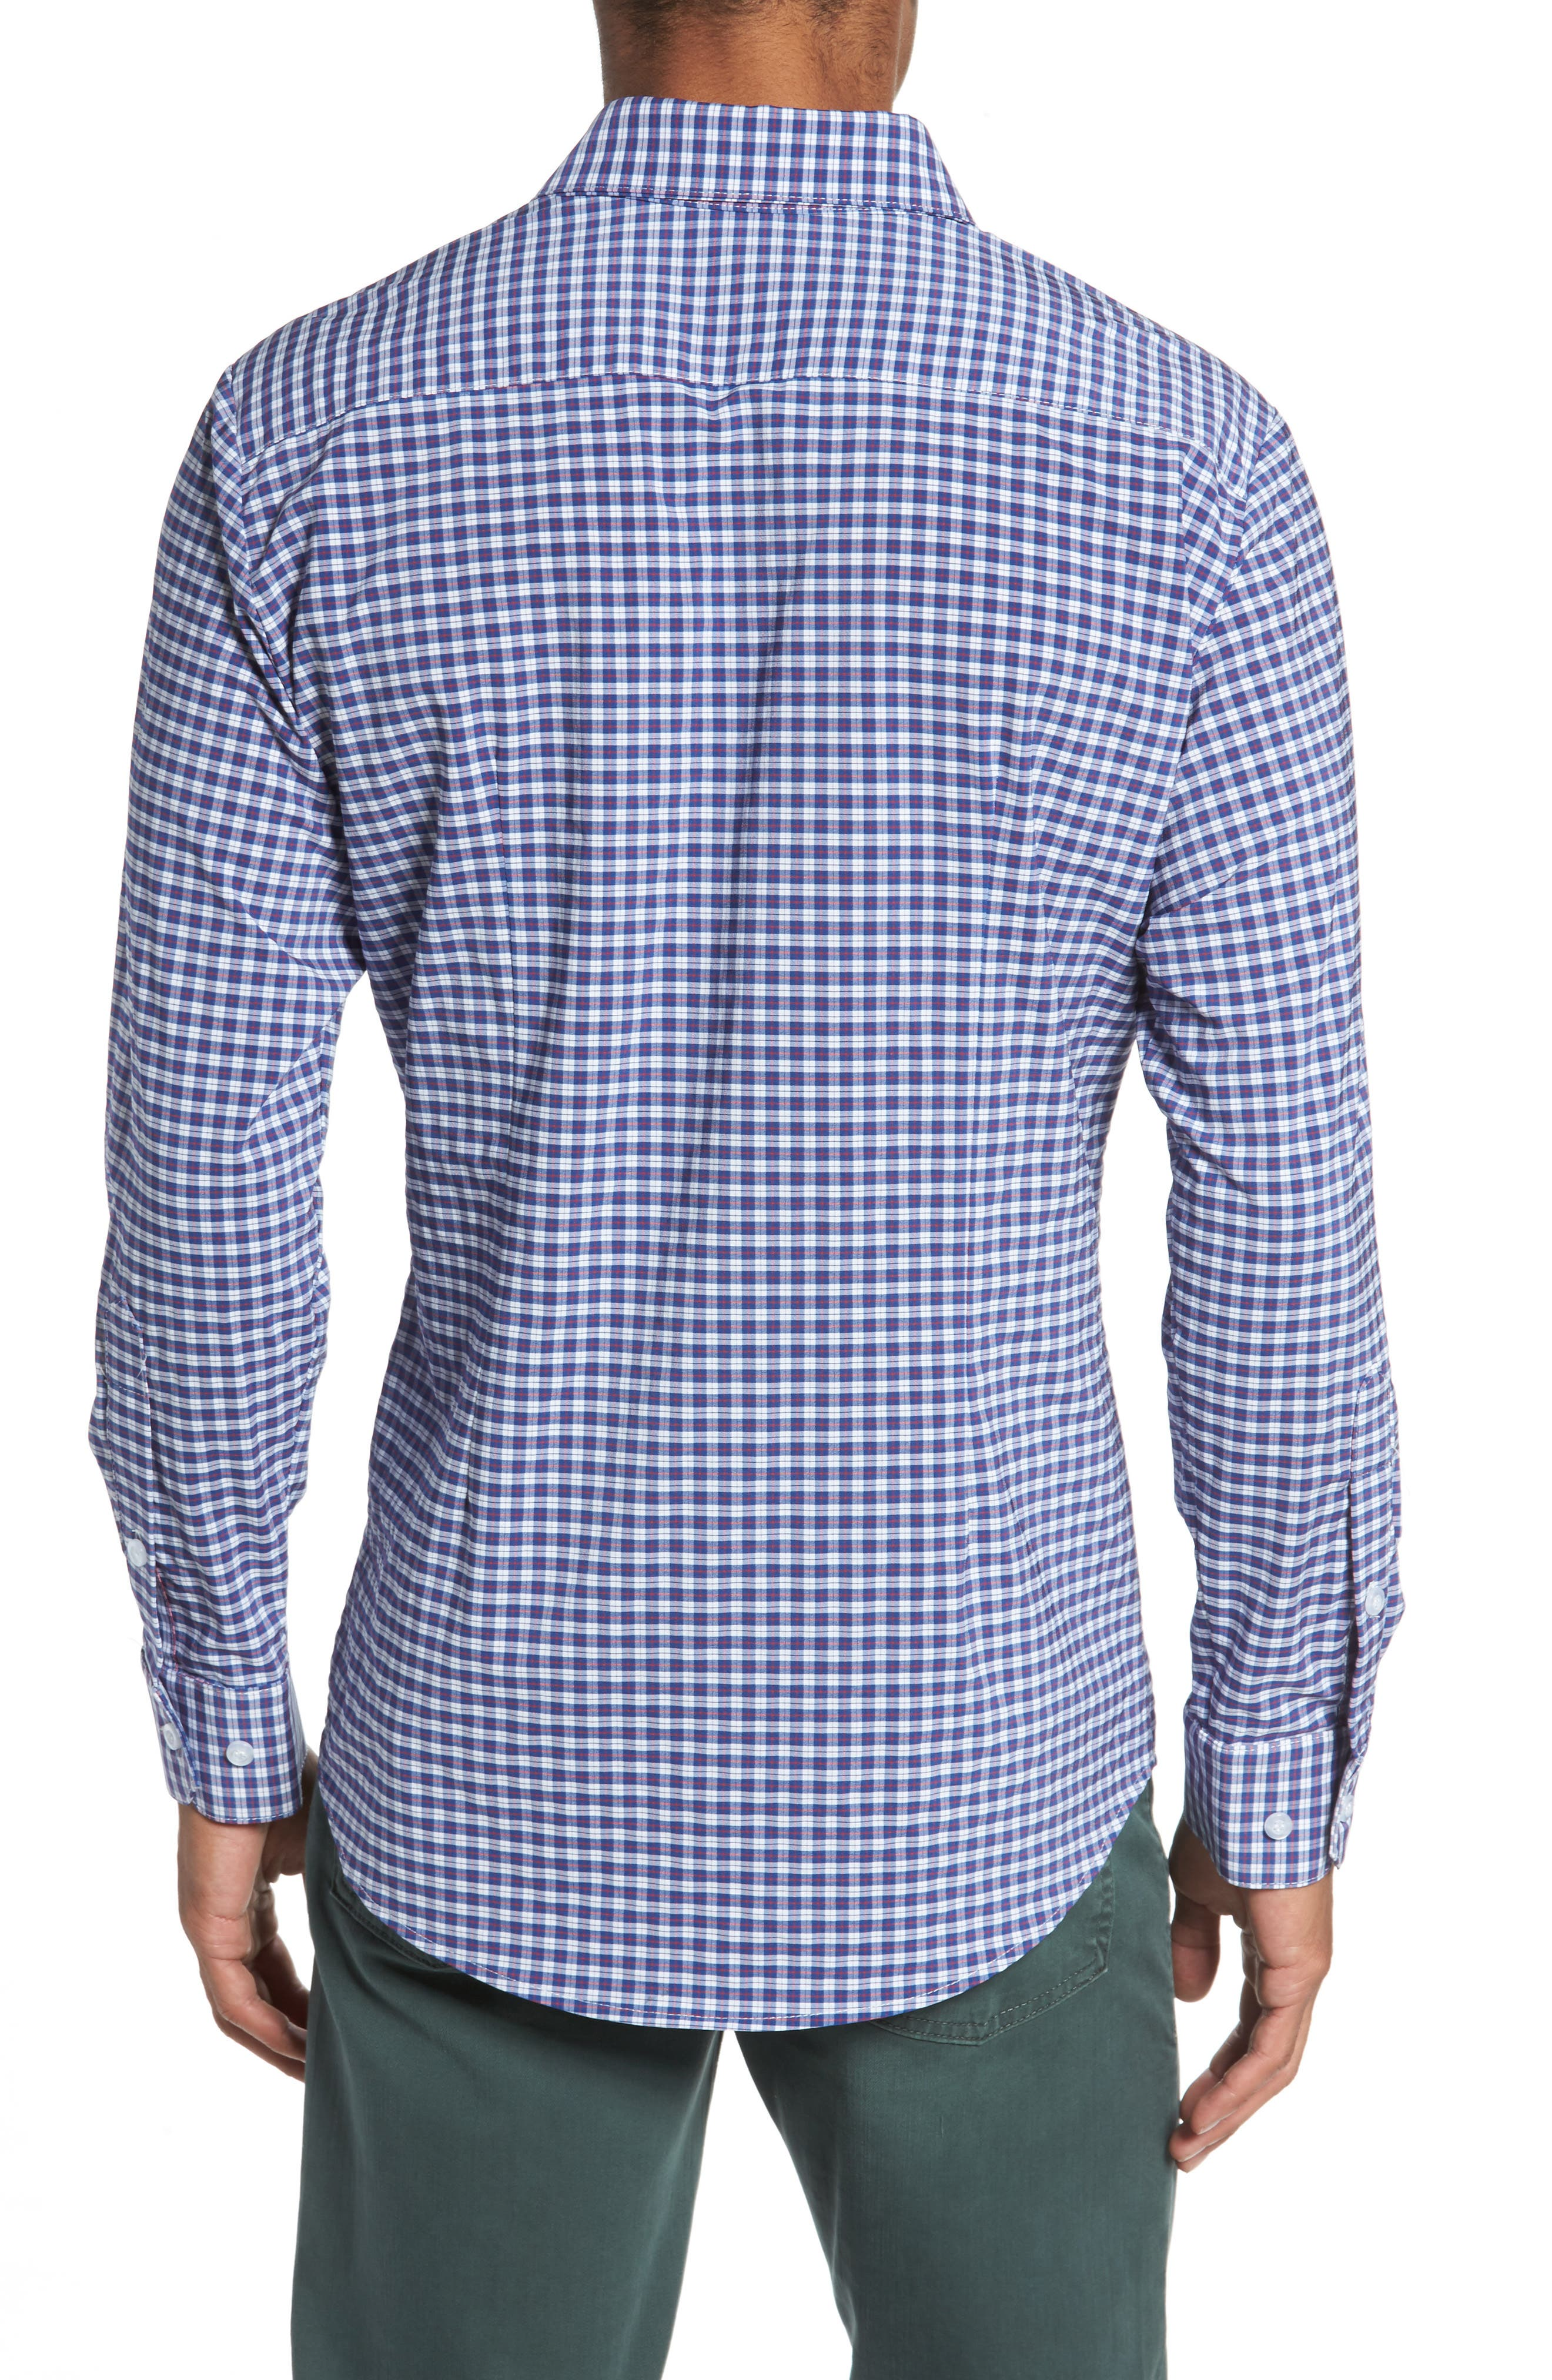 Alternate Image 2  - Mizzen+Main Howe 2.0 Plaid Sport Shirt